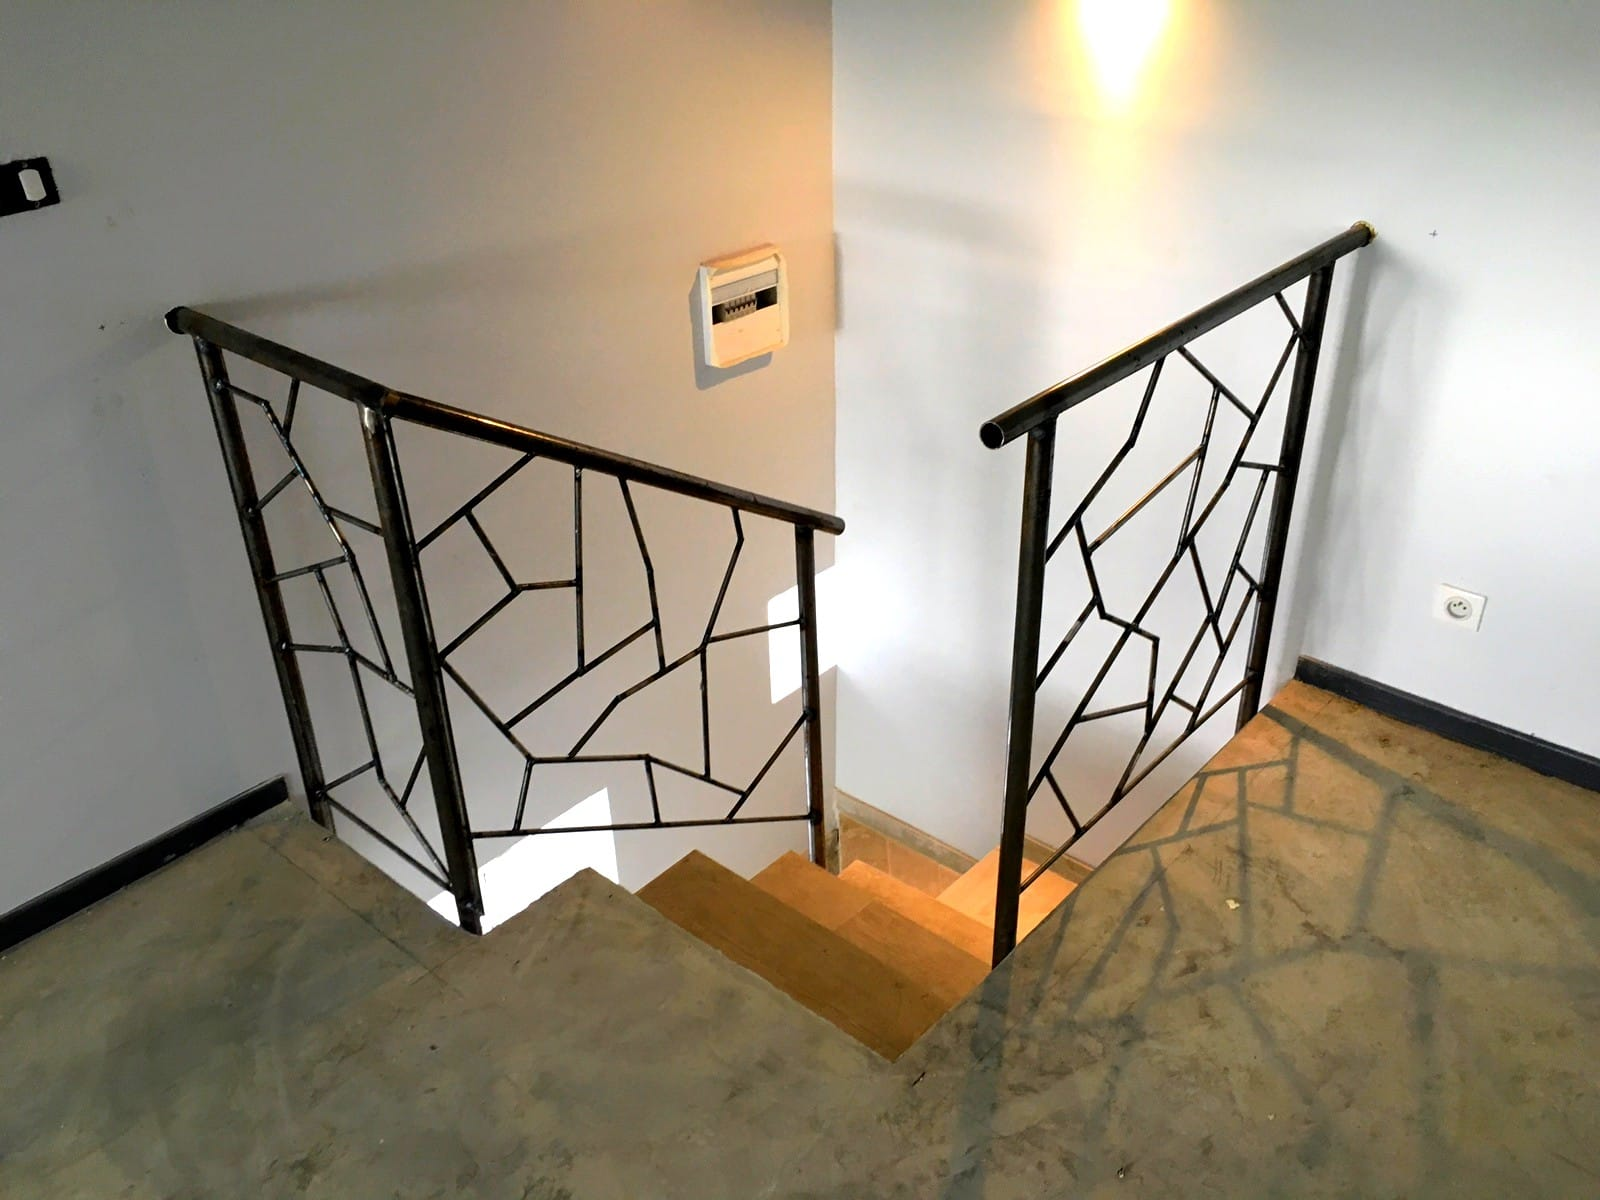 ara 39 nettoyage menus travaux de plomberie soudure peinture serrurerie. Black Bedroom Furniture Sets. Home Design Ideas